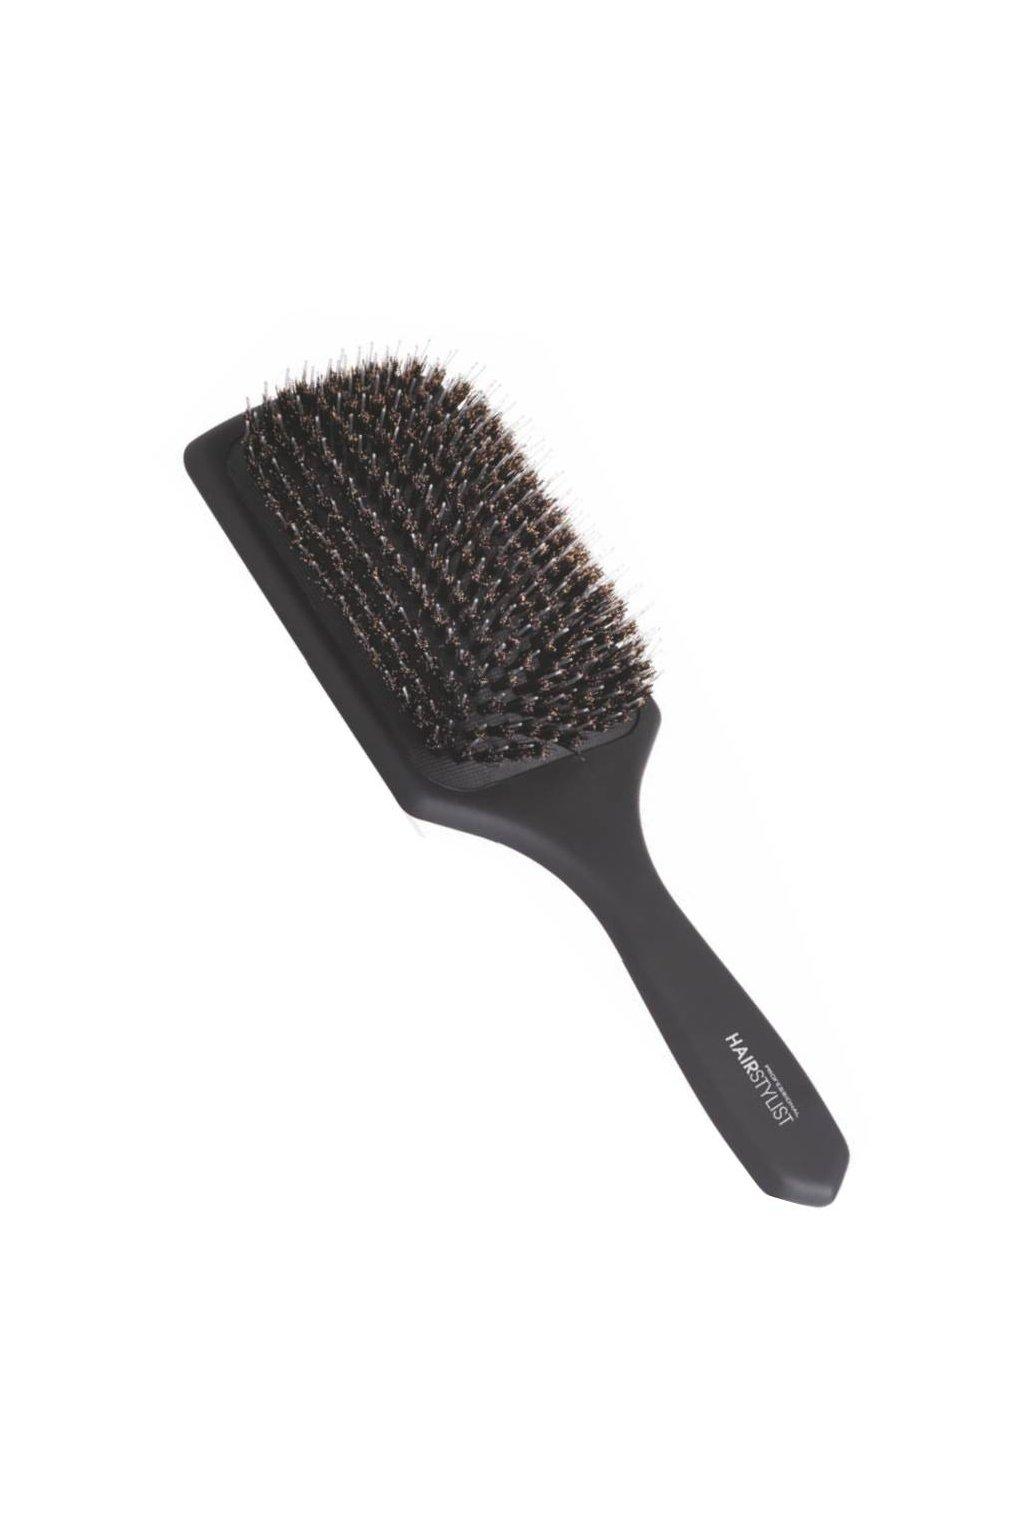 Kartáč Hair Stylist černý plochý široký, kančí štětiny +nylonové ostny 25x8x4cm